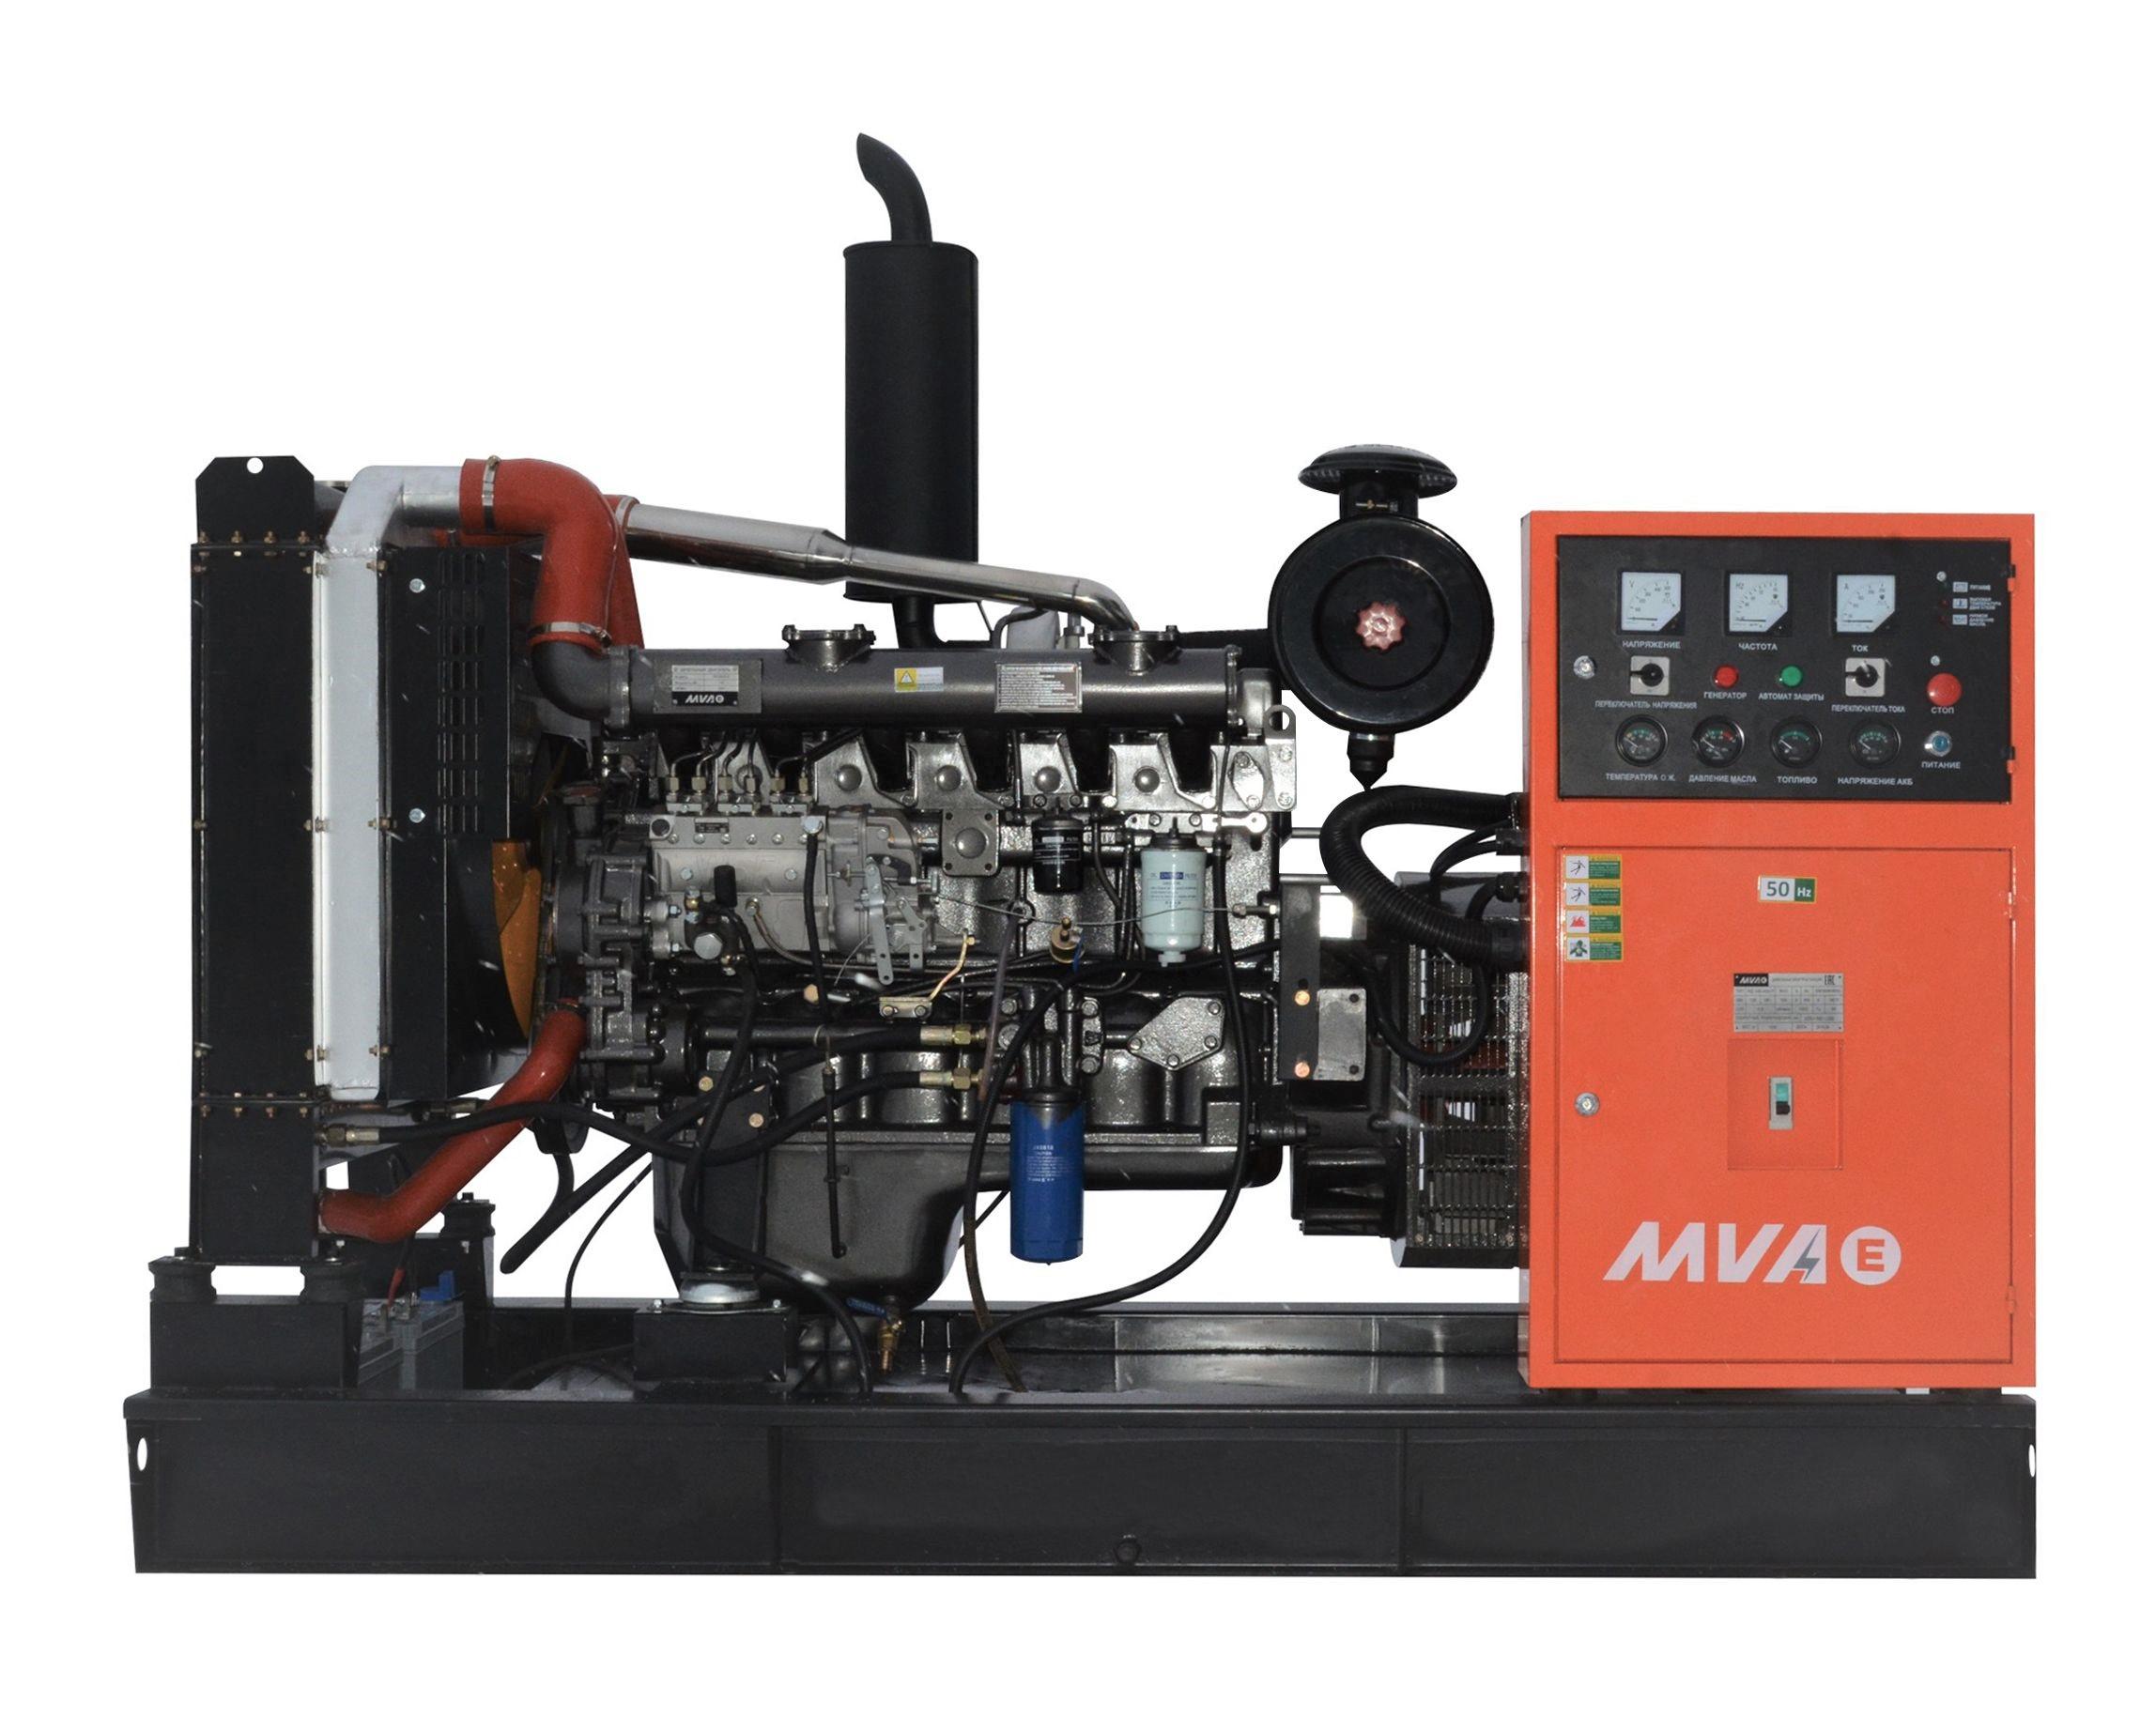 Дизель-генератор Mvae АД-100-400-Р